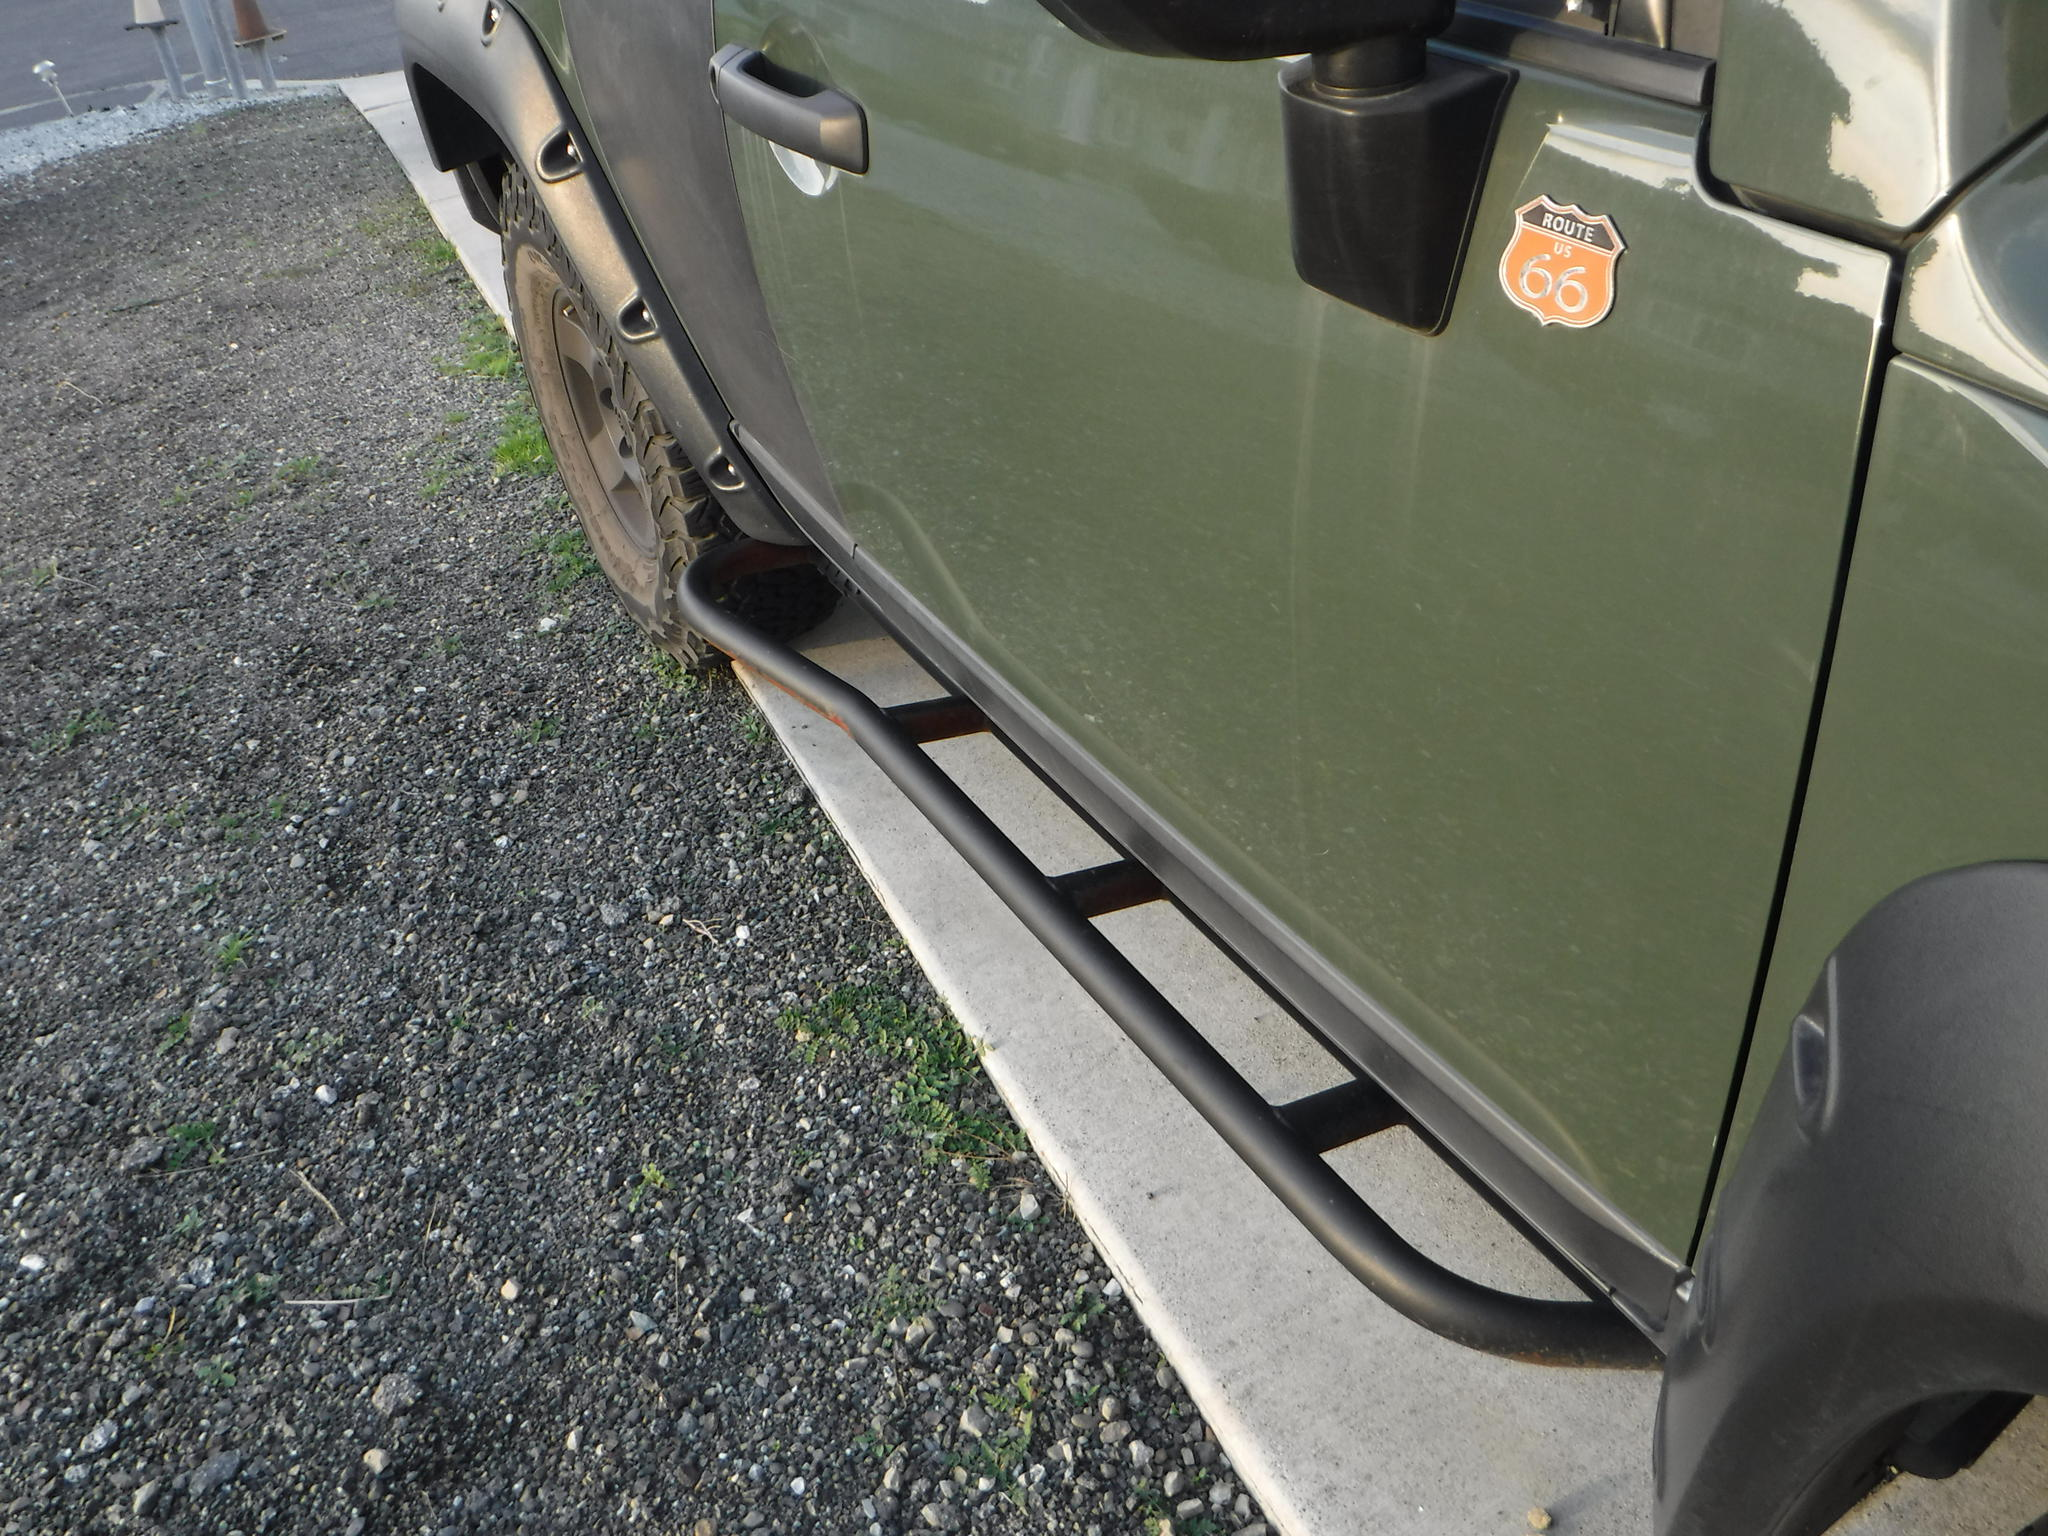 Toyota San Jose >> Rock Sliders All Pro Off Road Standard Duty $275 San Jose-CA - Toyota FJ Cruiser Forum